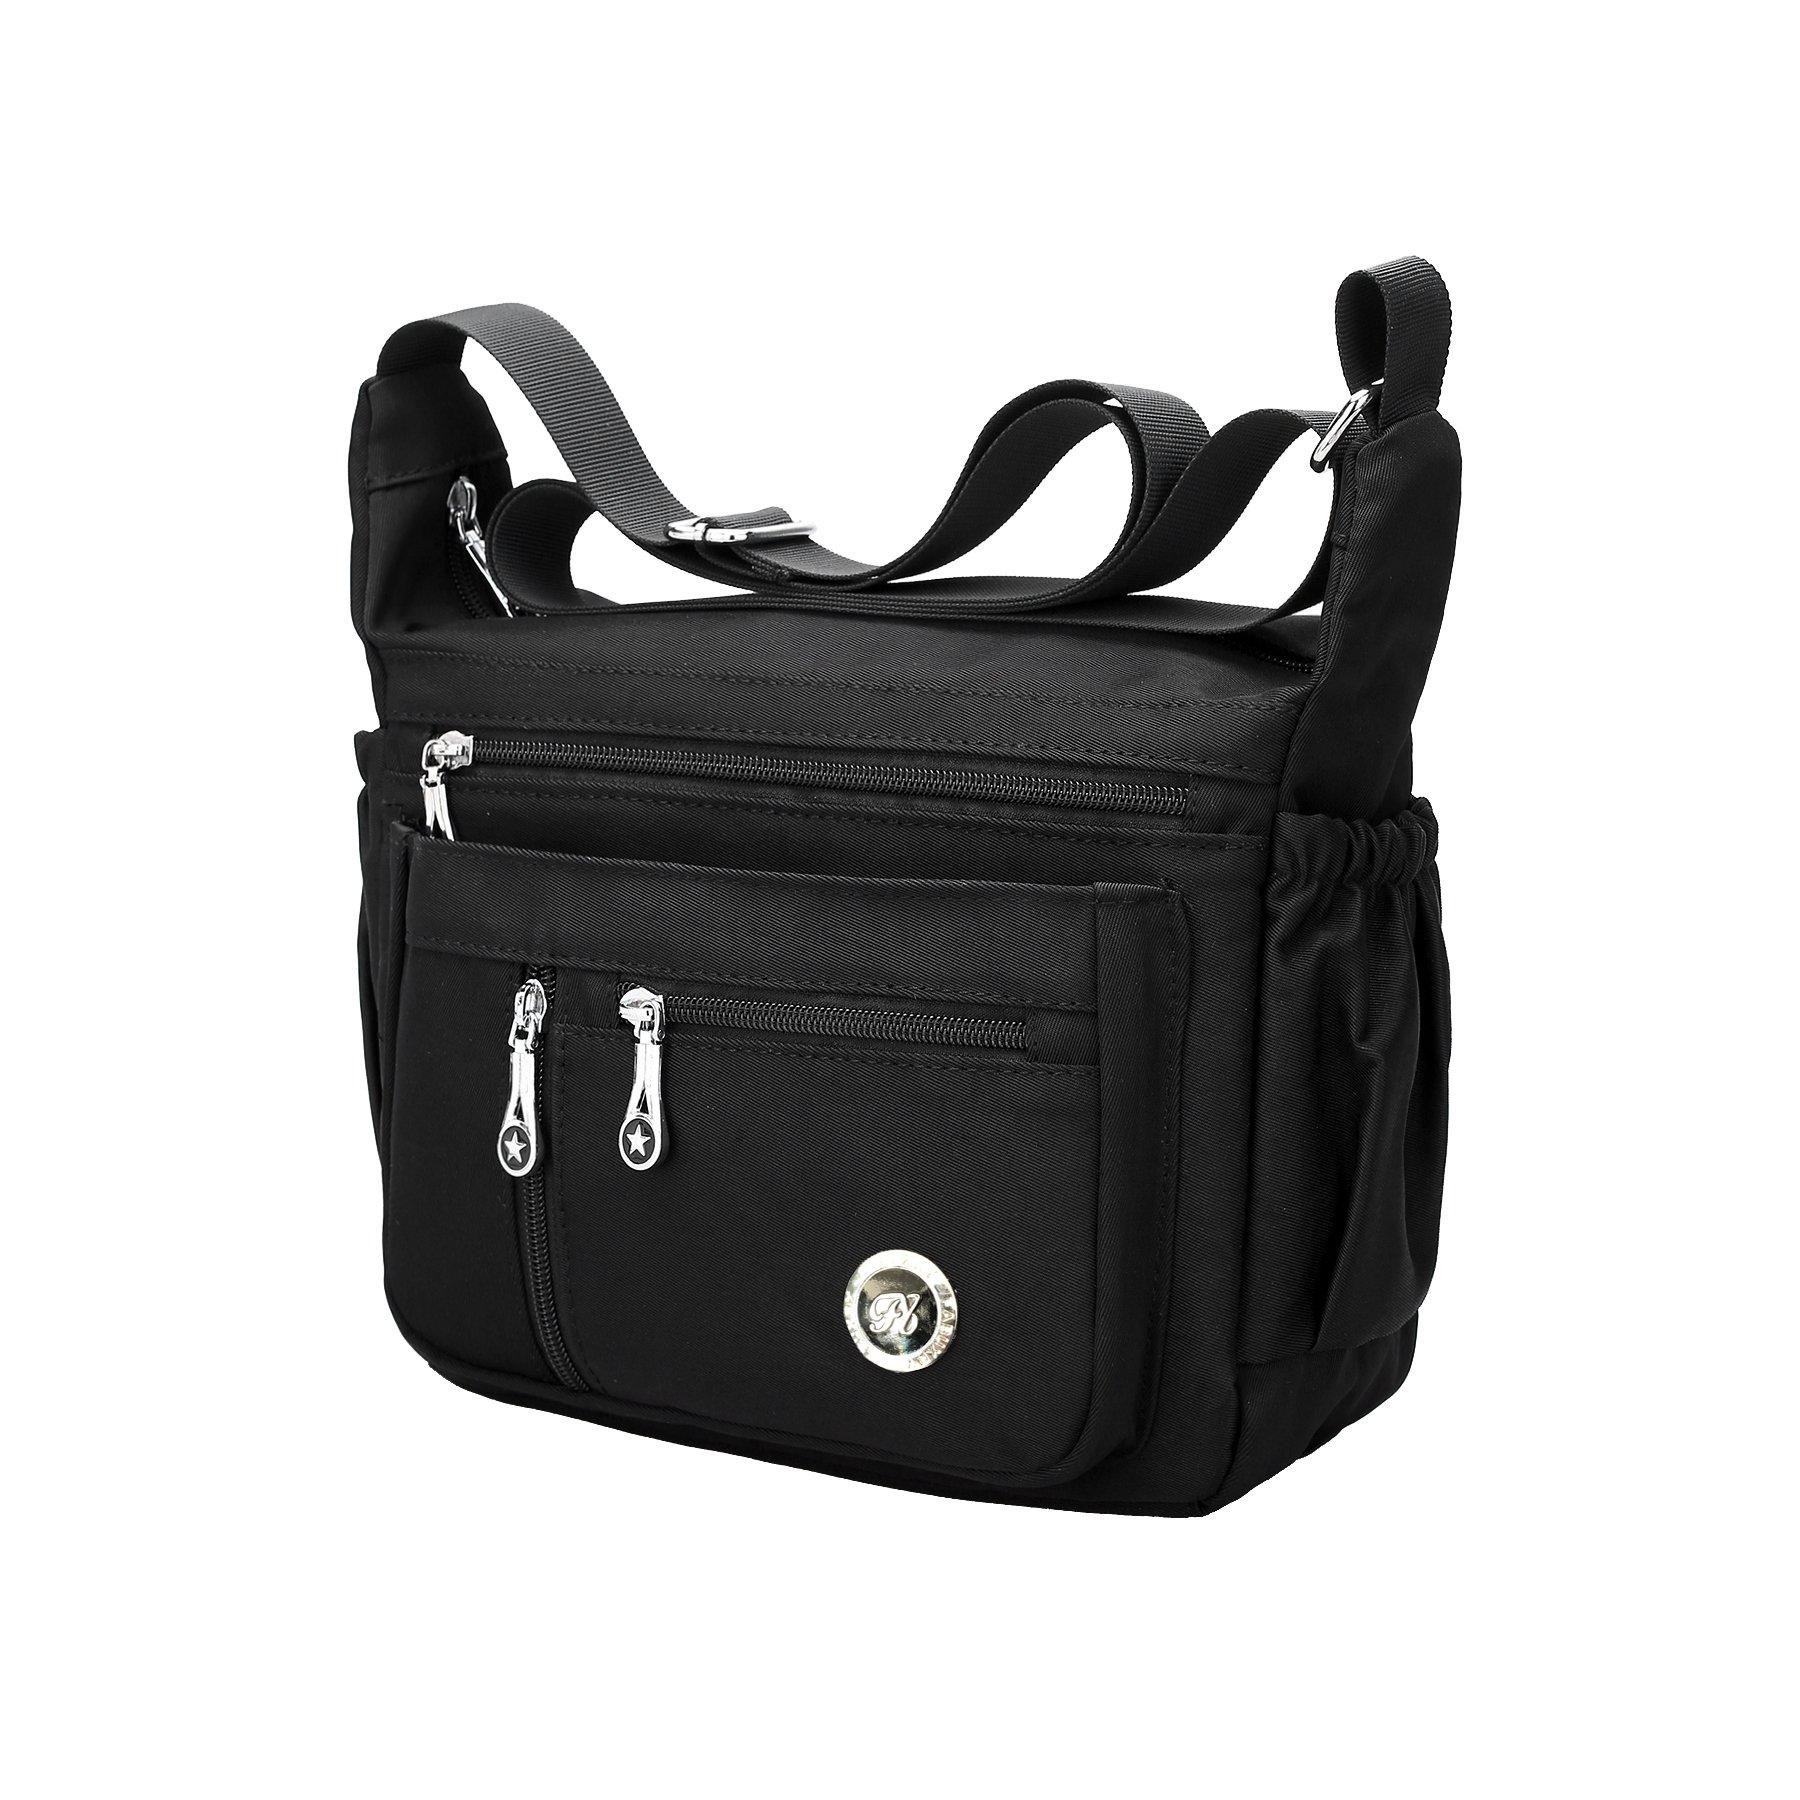 Fabuxry Purses and Shoulder Handbags for Women Crossbody Bag Messenger Bags (Black)